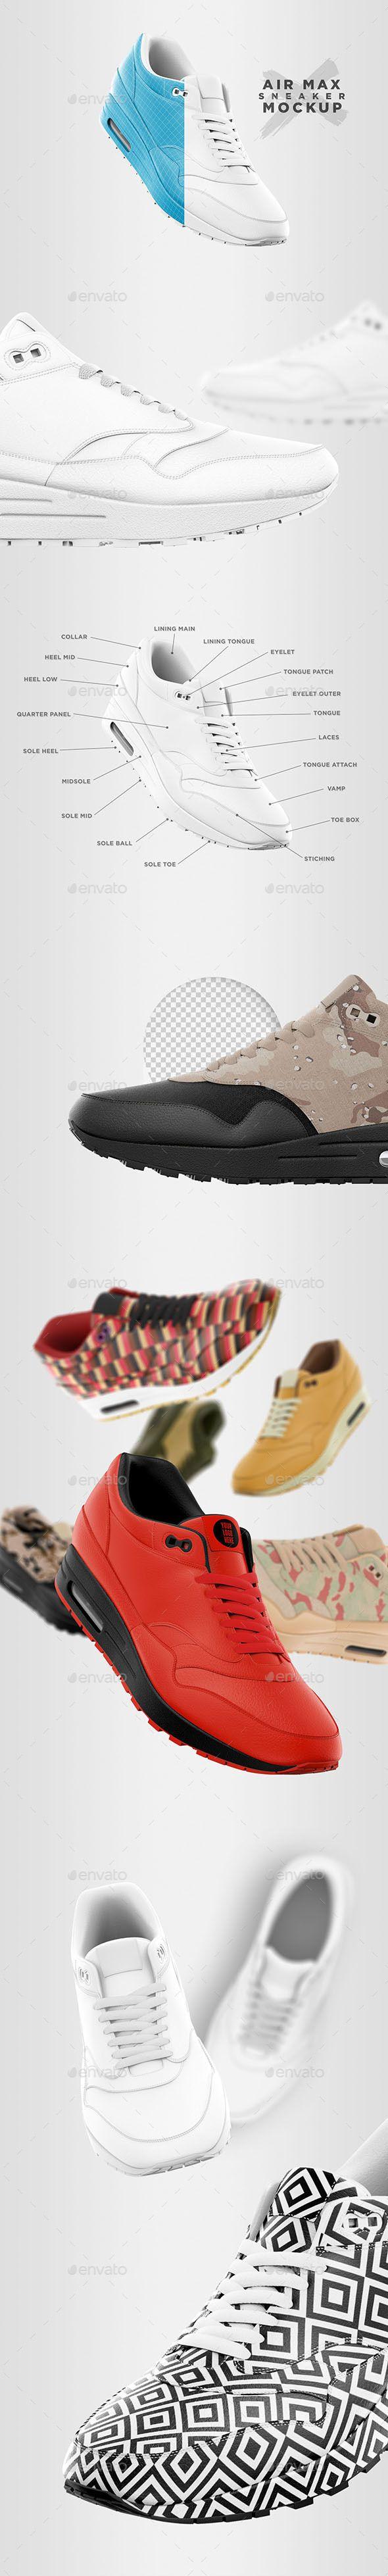 Download Air Max Sneaker Mockup Clothing Mockup Air Max Sneakers Air Max